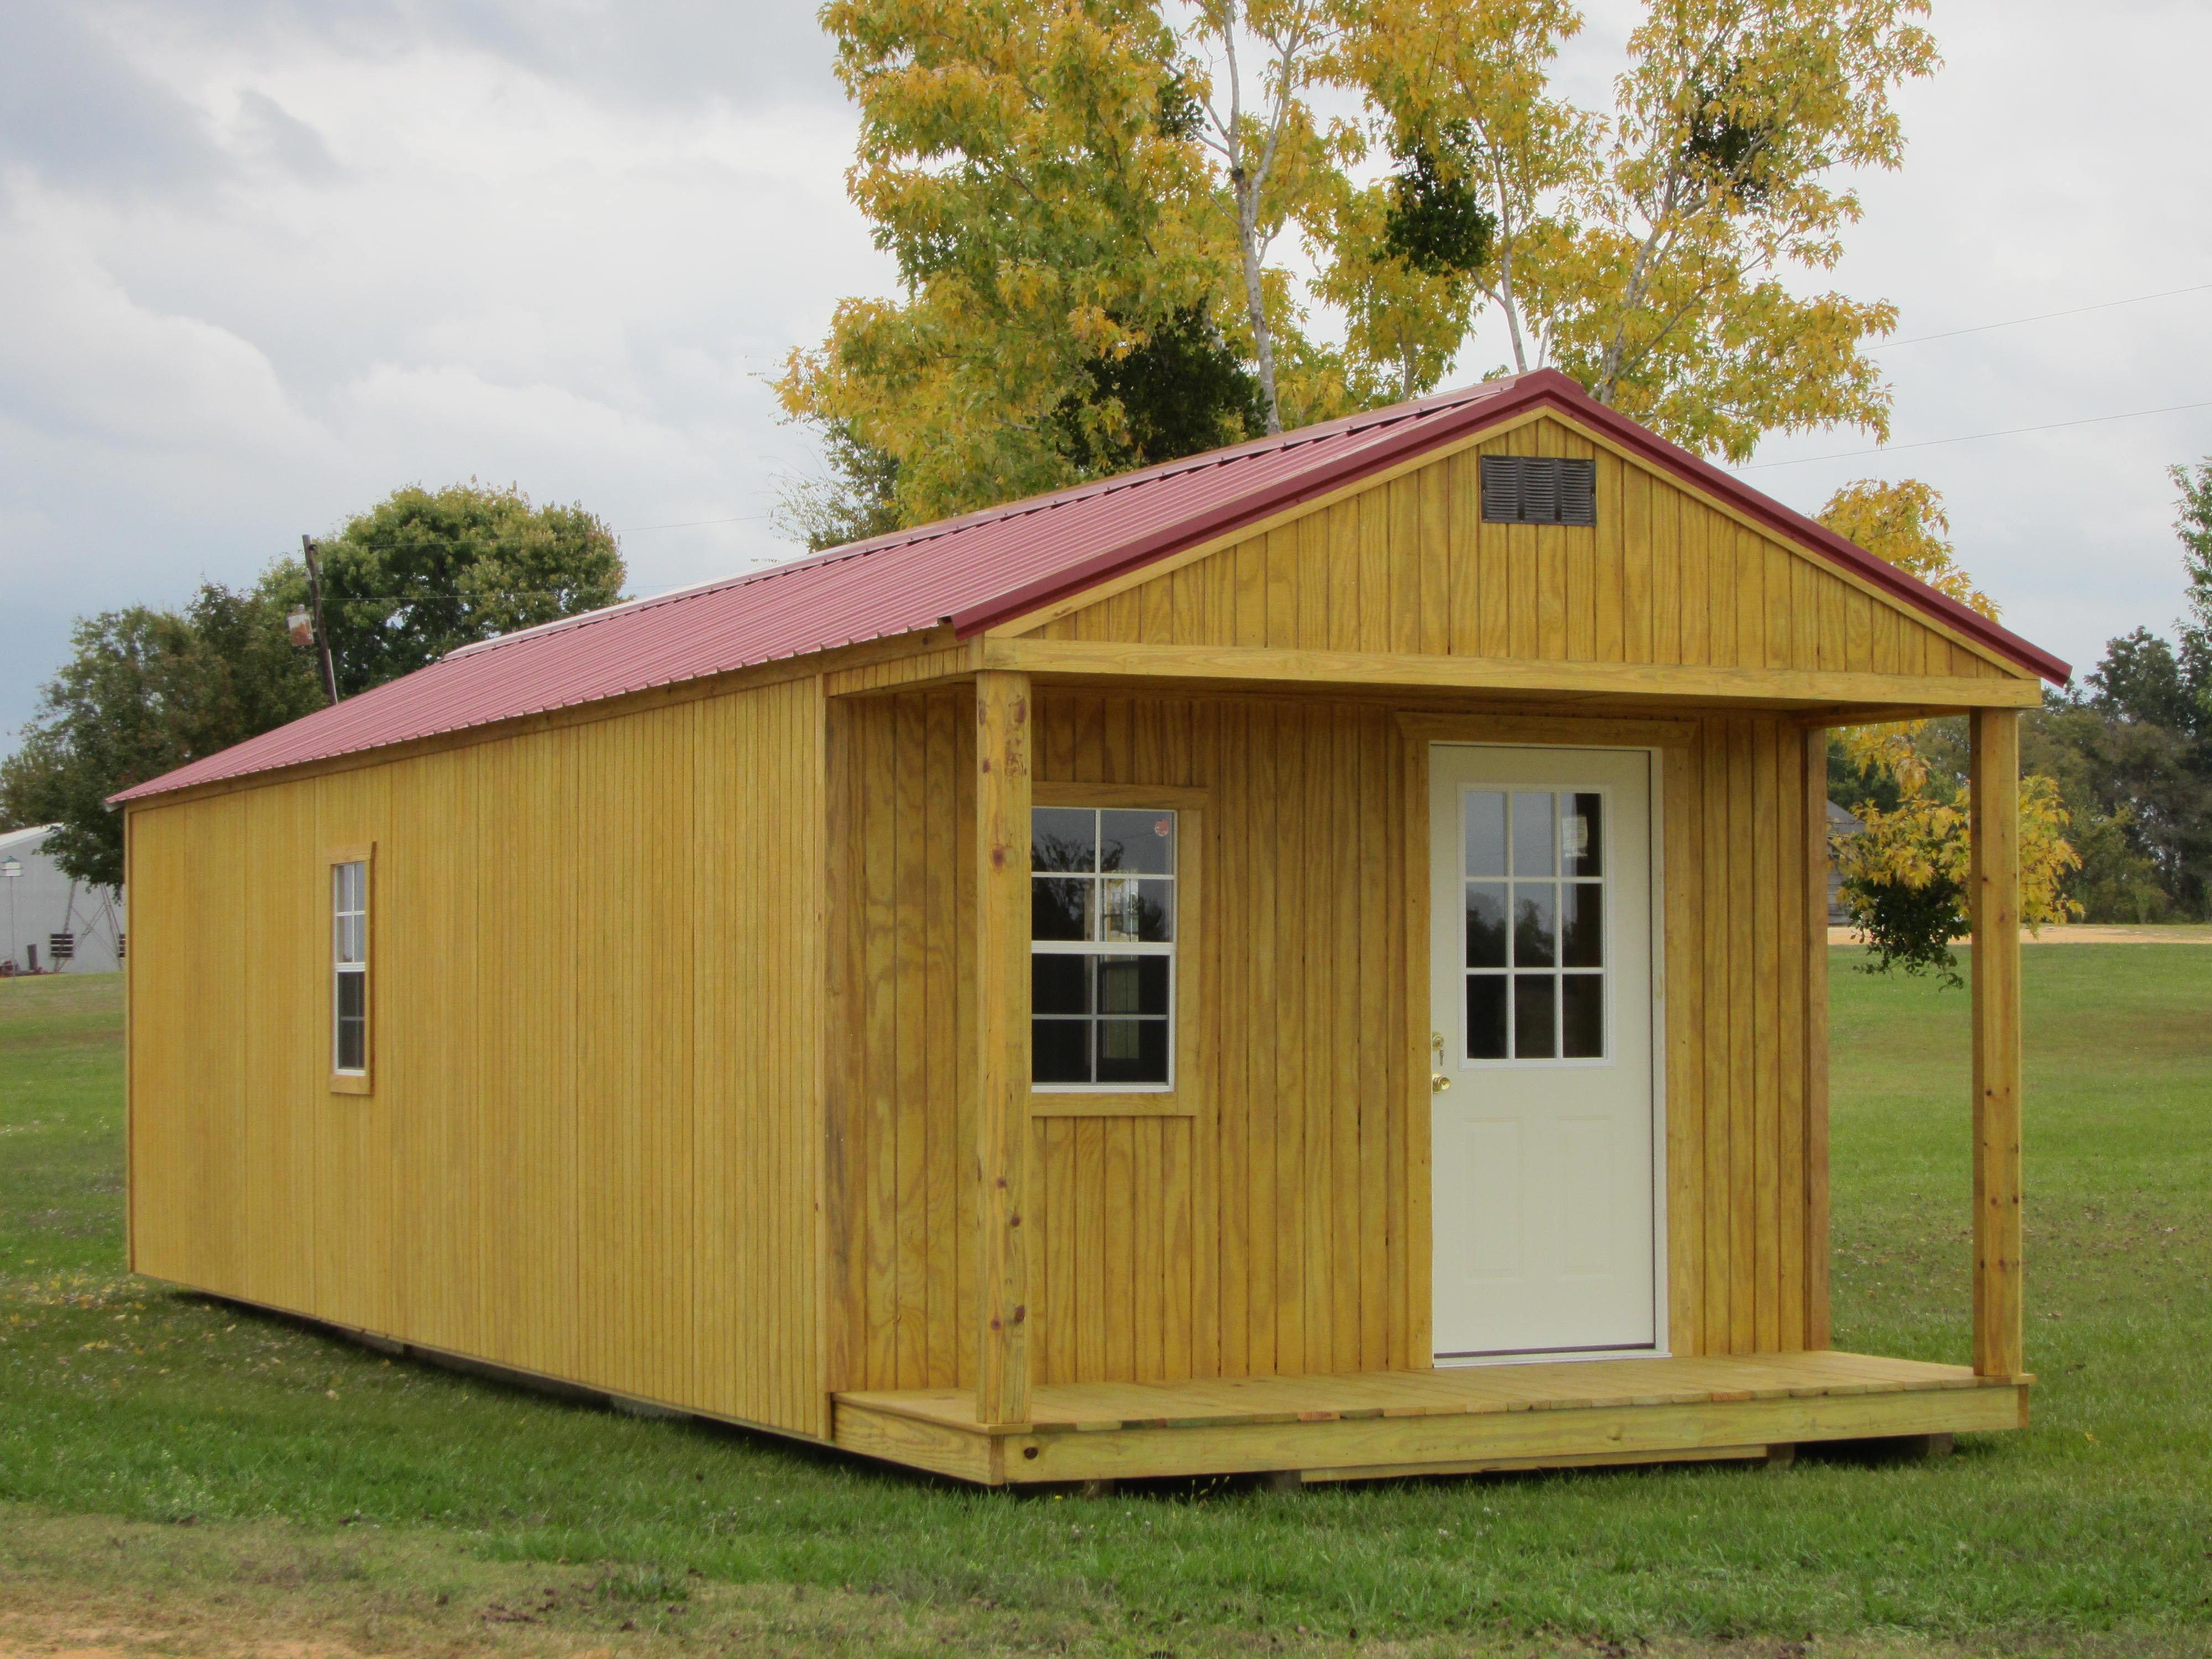 Portable Buildings In Alabama : Probilt portable storage buildings barns sheds cabins